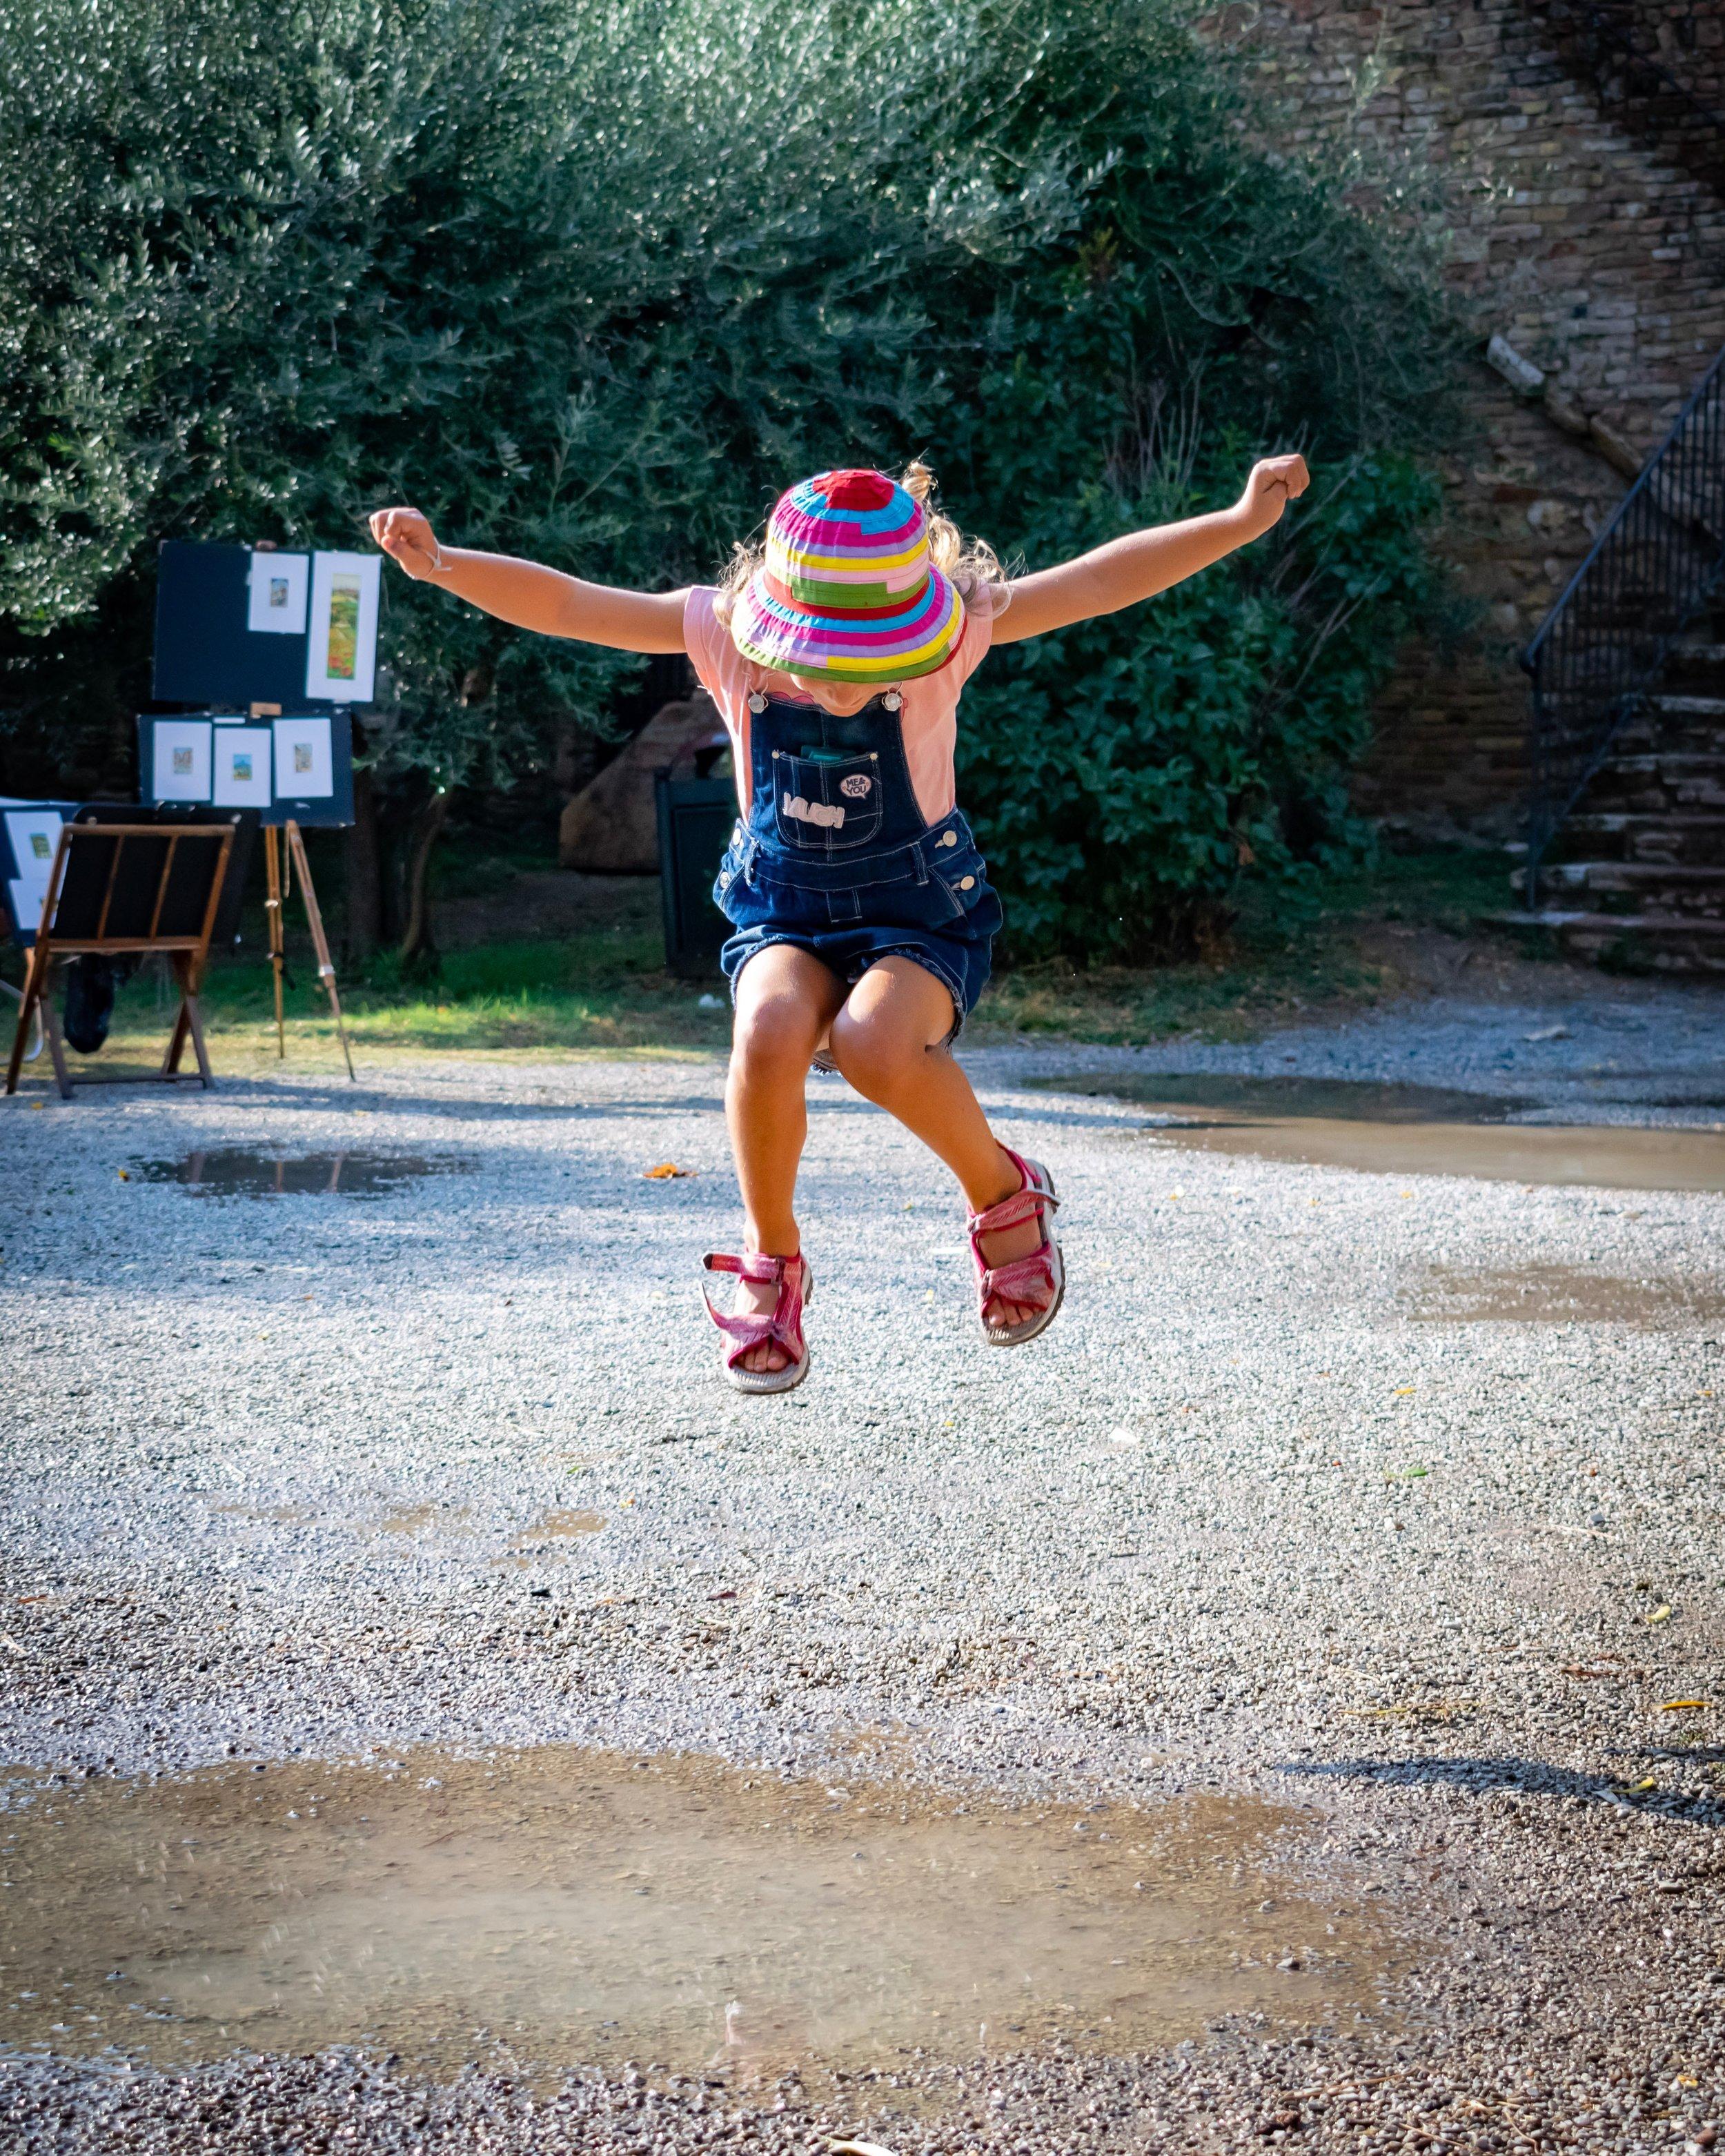 child-energy-fun-1799881.jpg